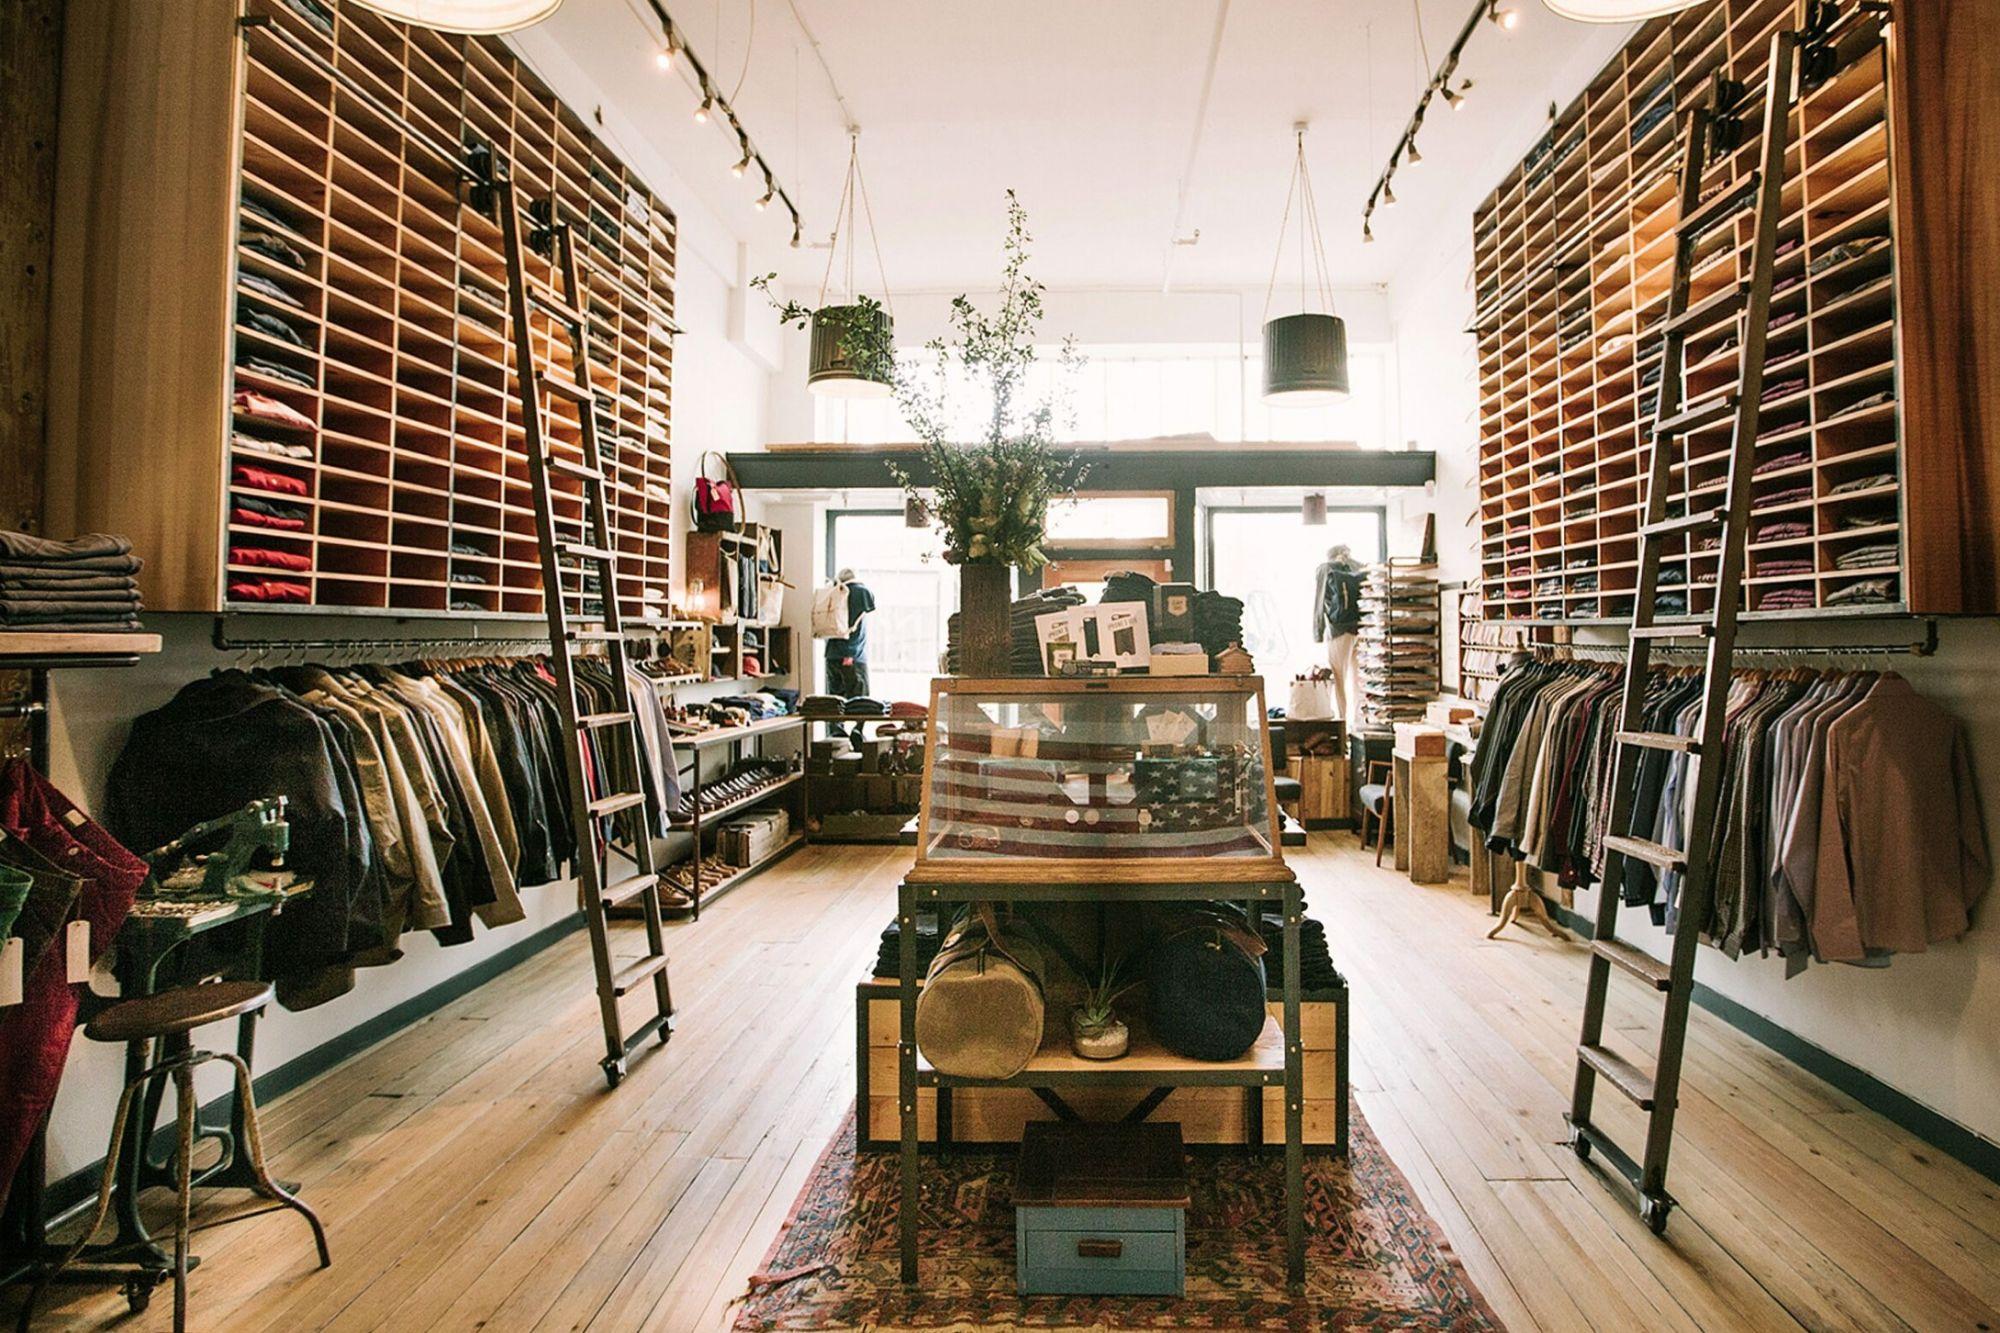 Taylor Stitch Makes Us Rethink Our Wardrobe